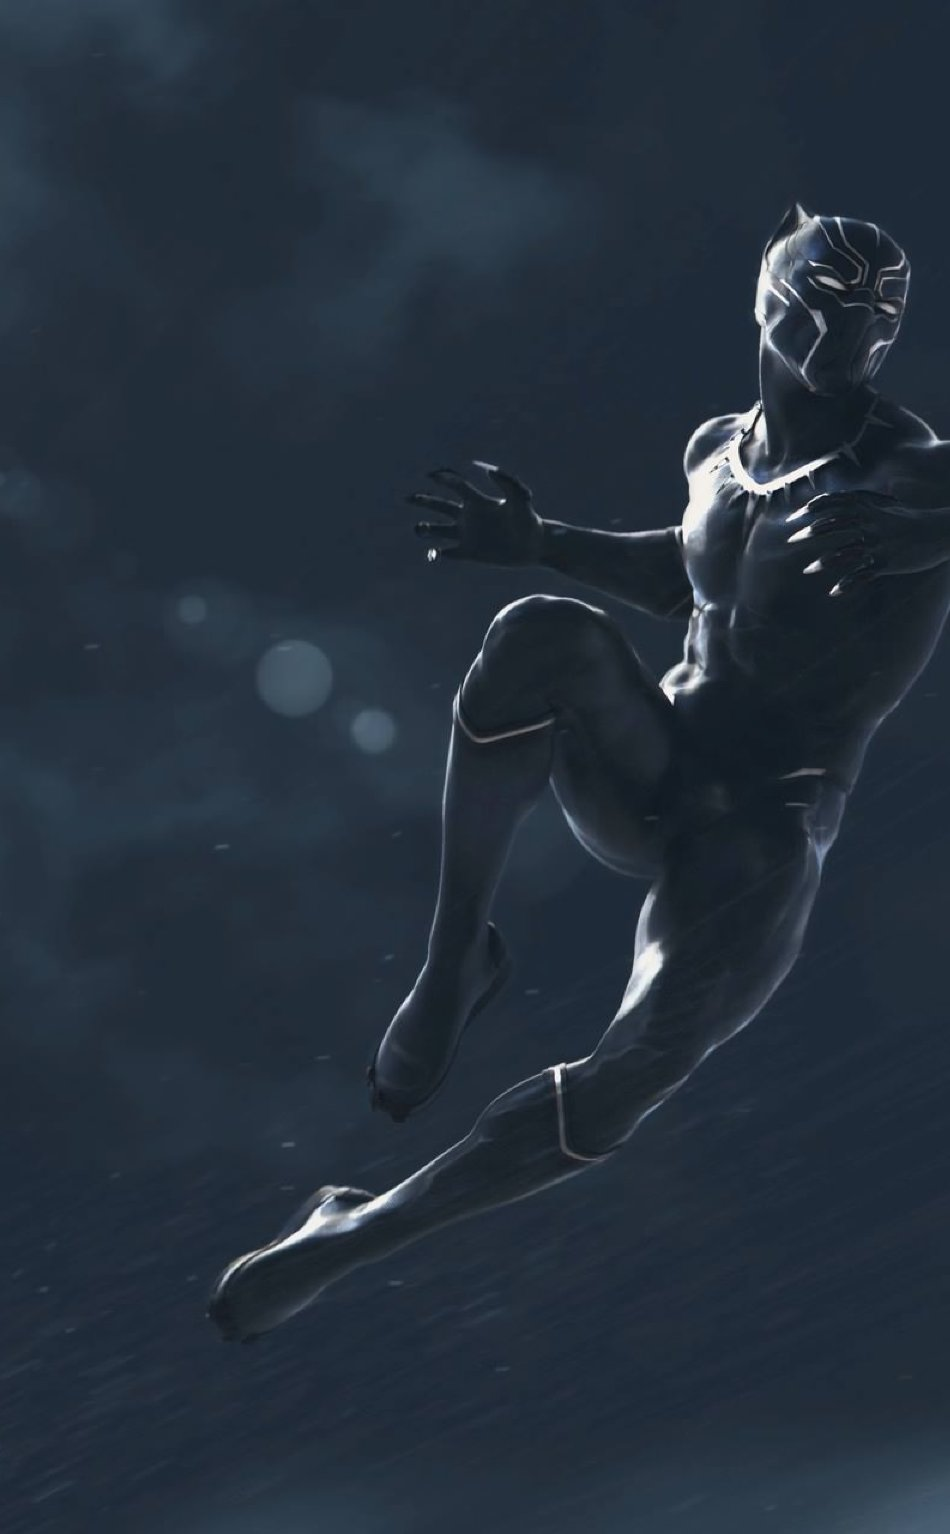 Black Panther Marvel Movie Full HD Wallpaper 950x1534